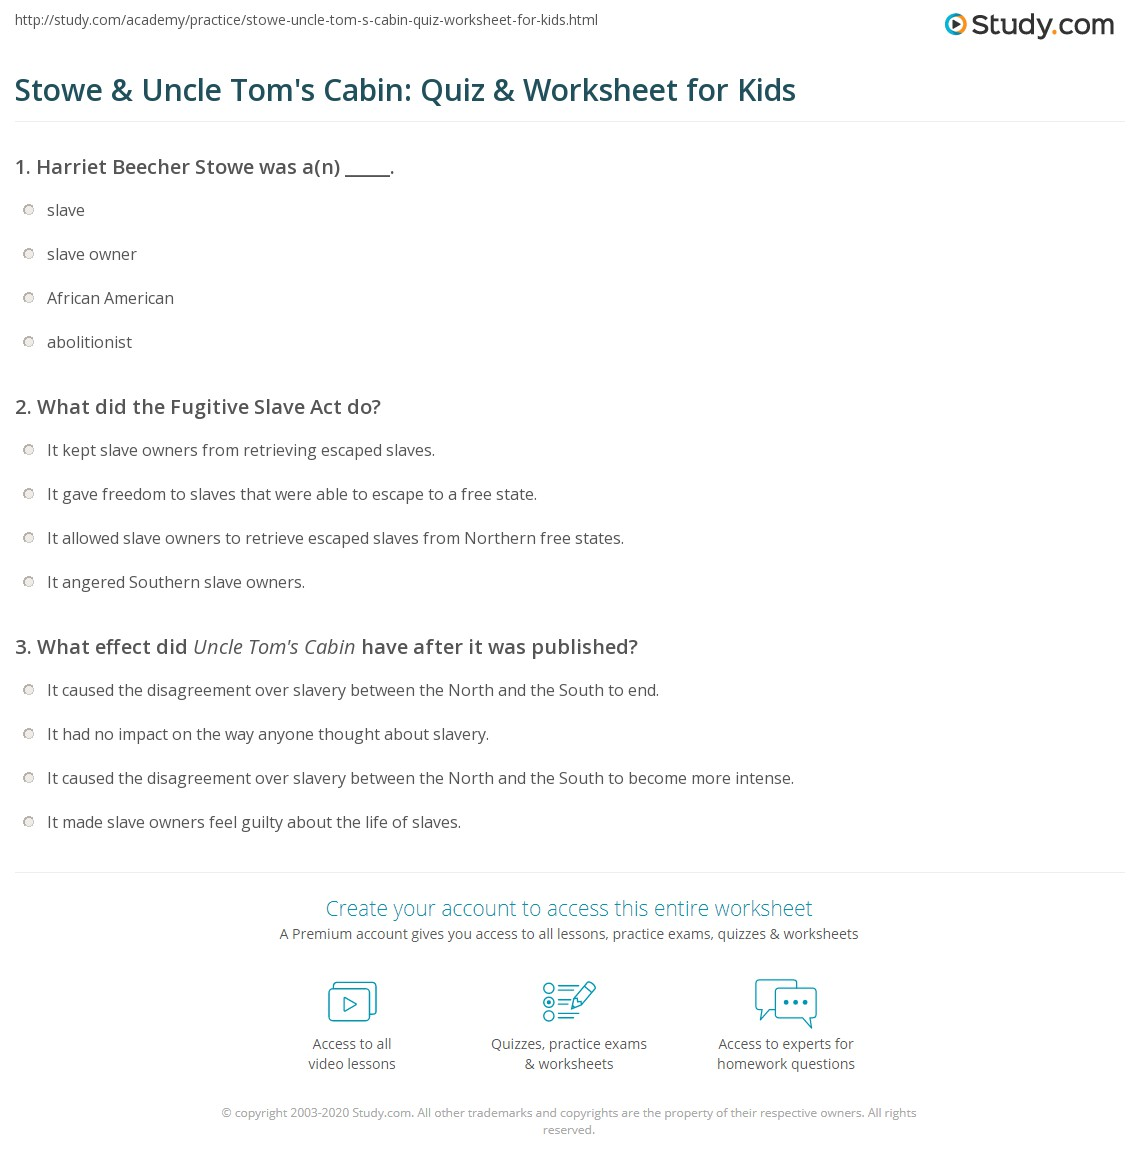 Stowe Amp Uncle Tom S Cabin Quiz Amp Worksheet For Kids